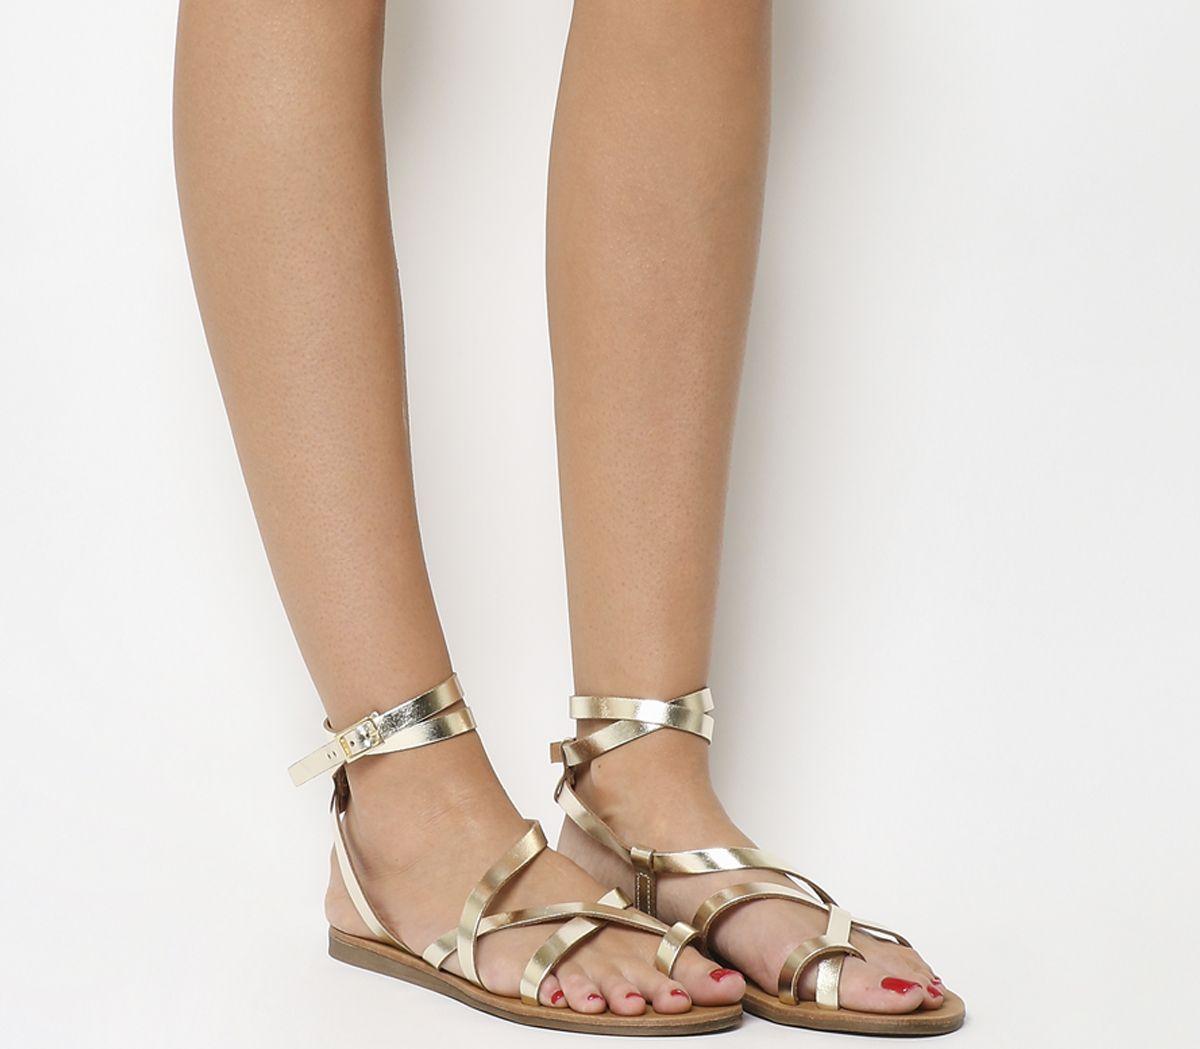 c9597413a Office Salvador Toe Loop Gladiator Sandals Gold Leather - Sandals